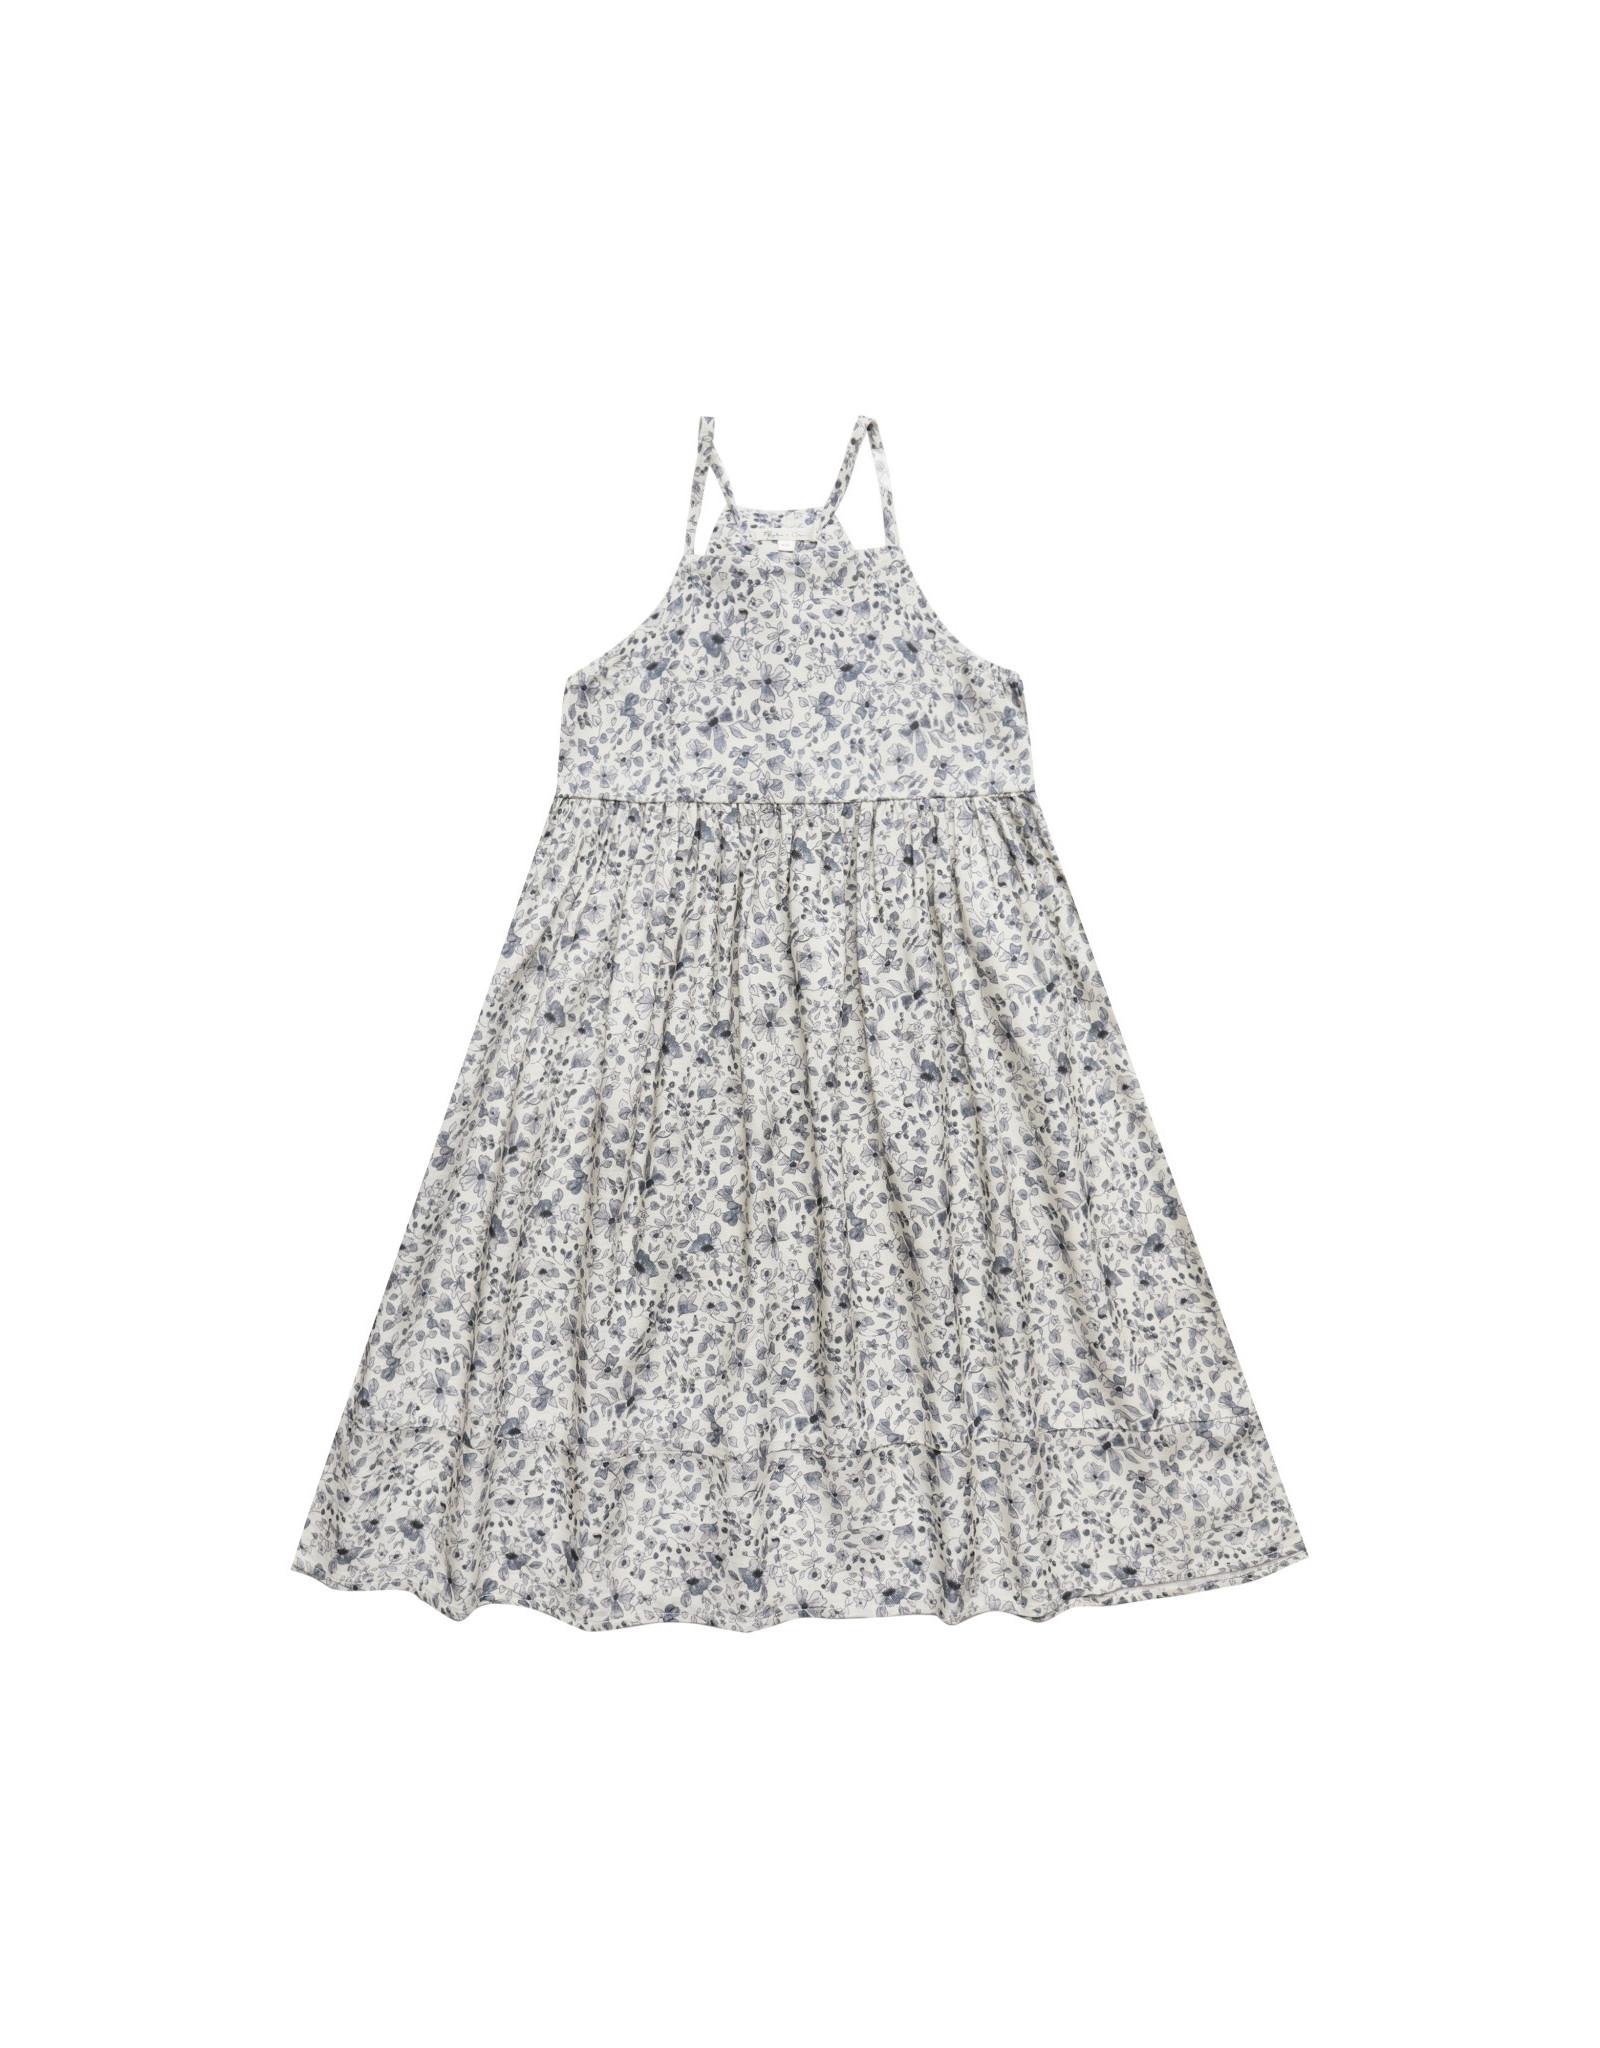 Rylee + Cru Blue Floral Ava Dress